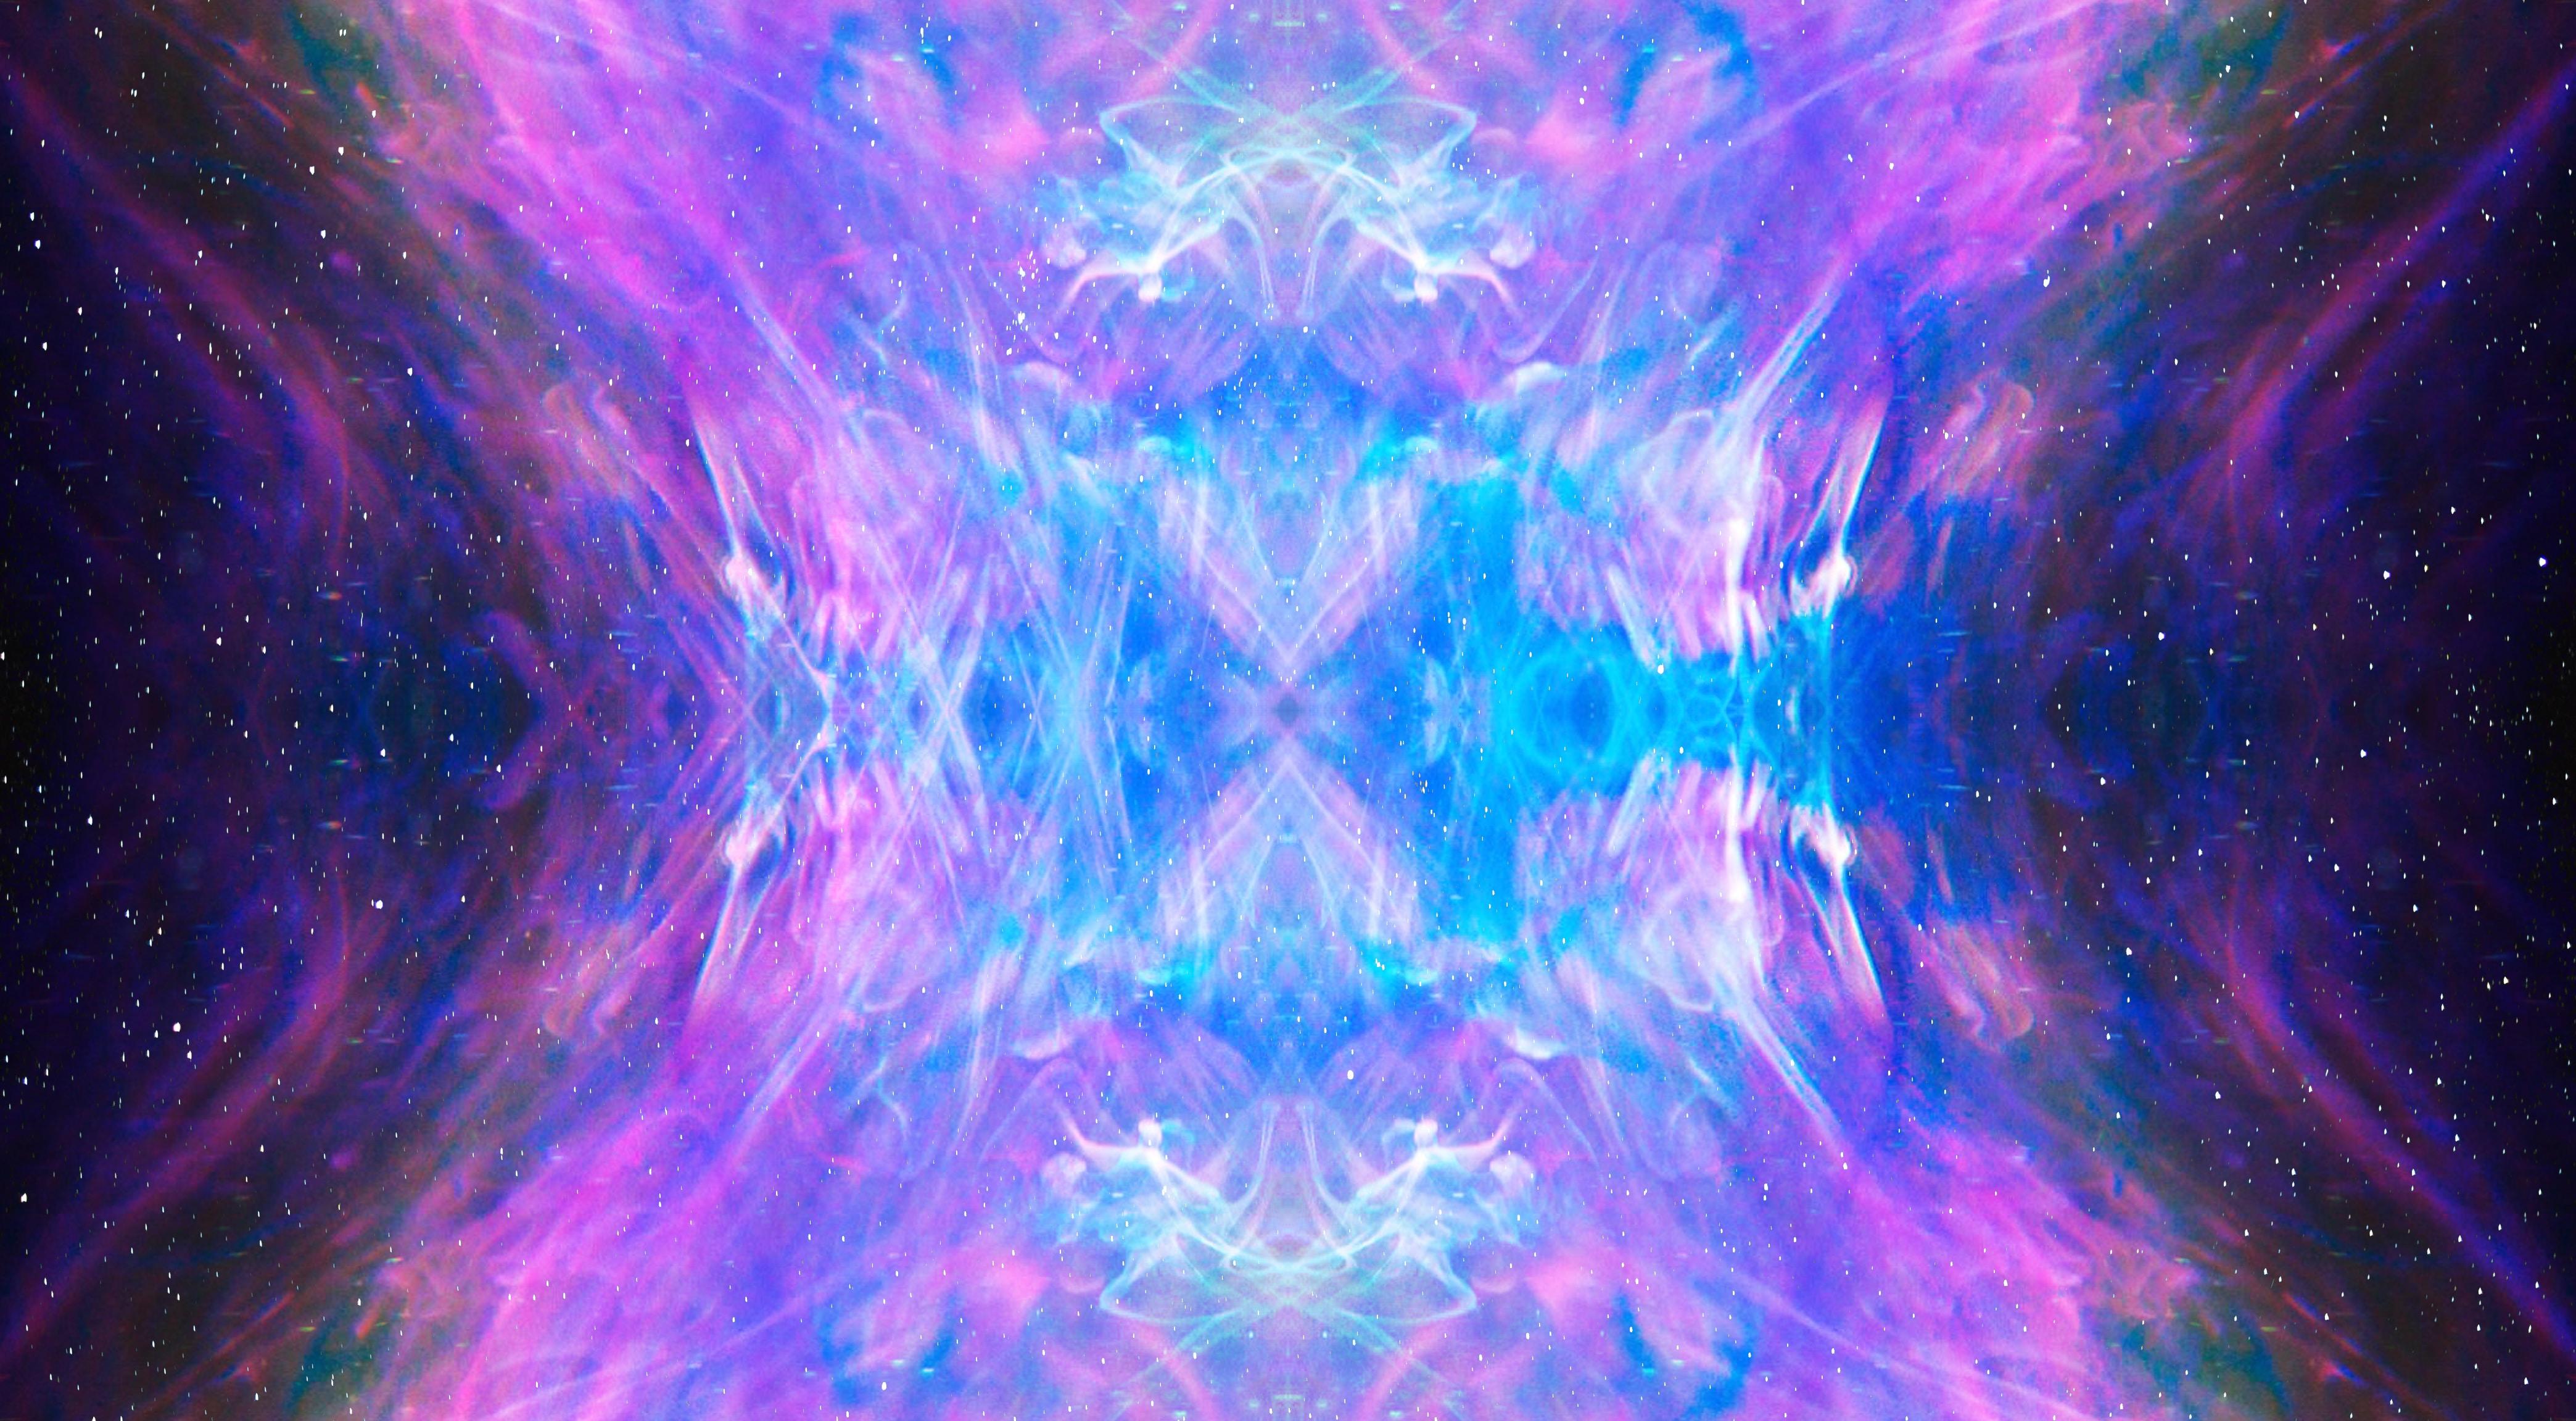 purple and pink illusion artwork